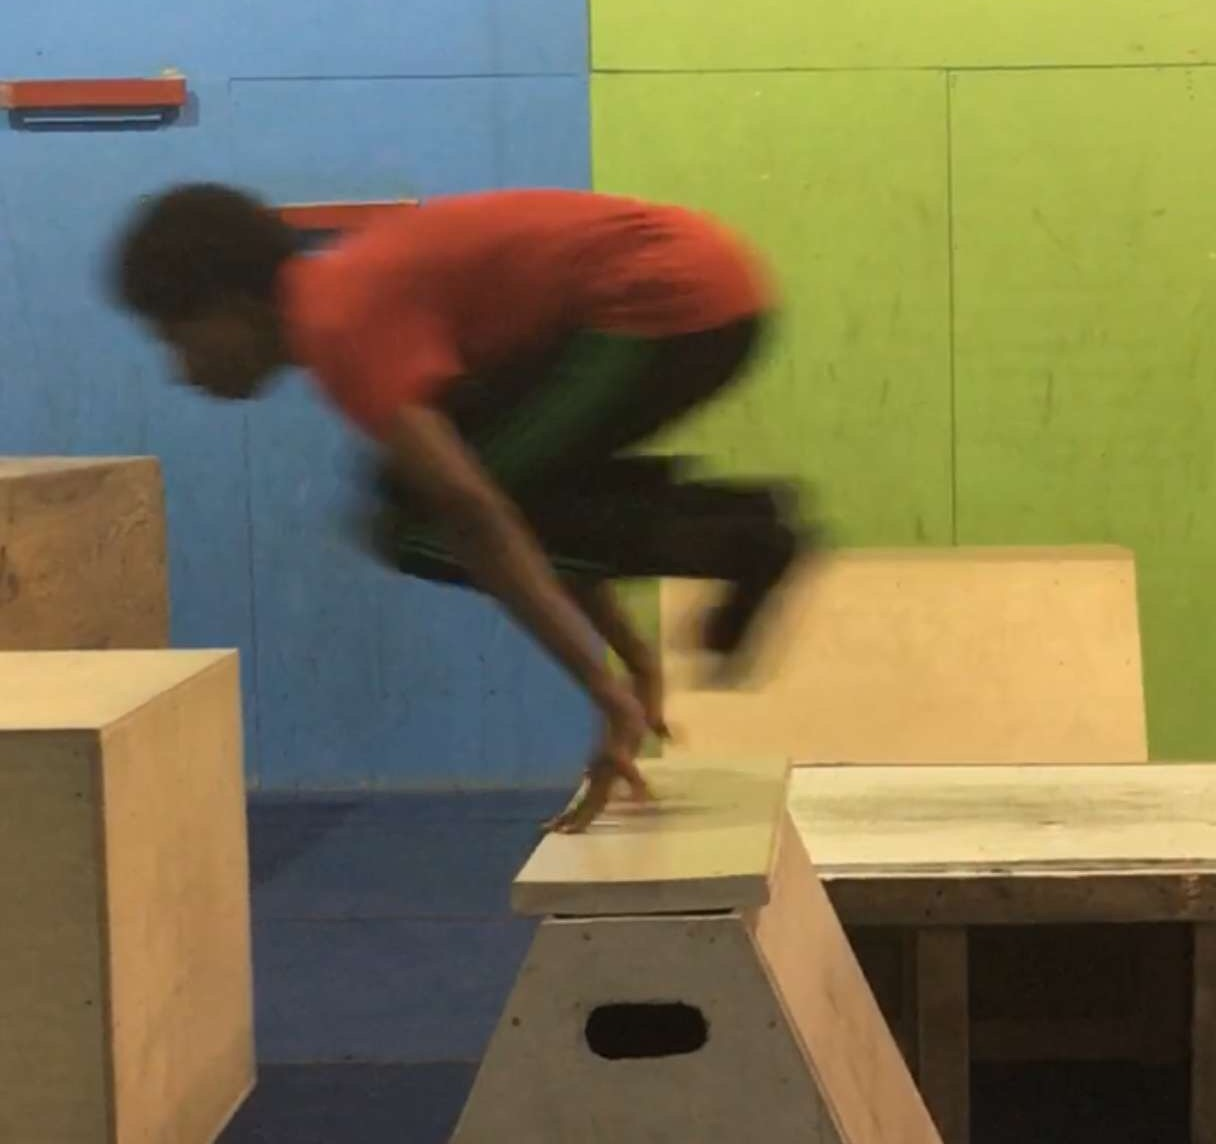 Junior Imran leaps across an obstacle as he freeruns across a parkour course.